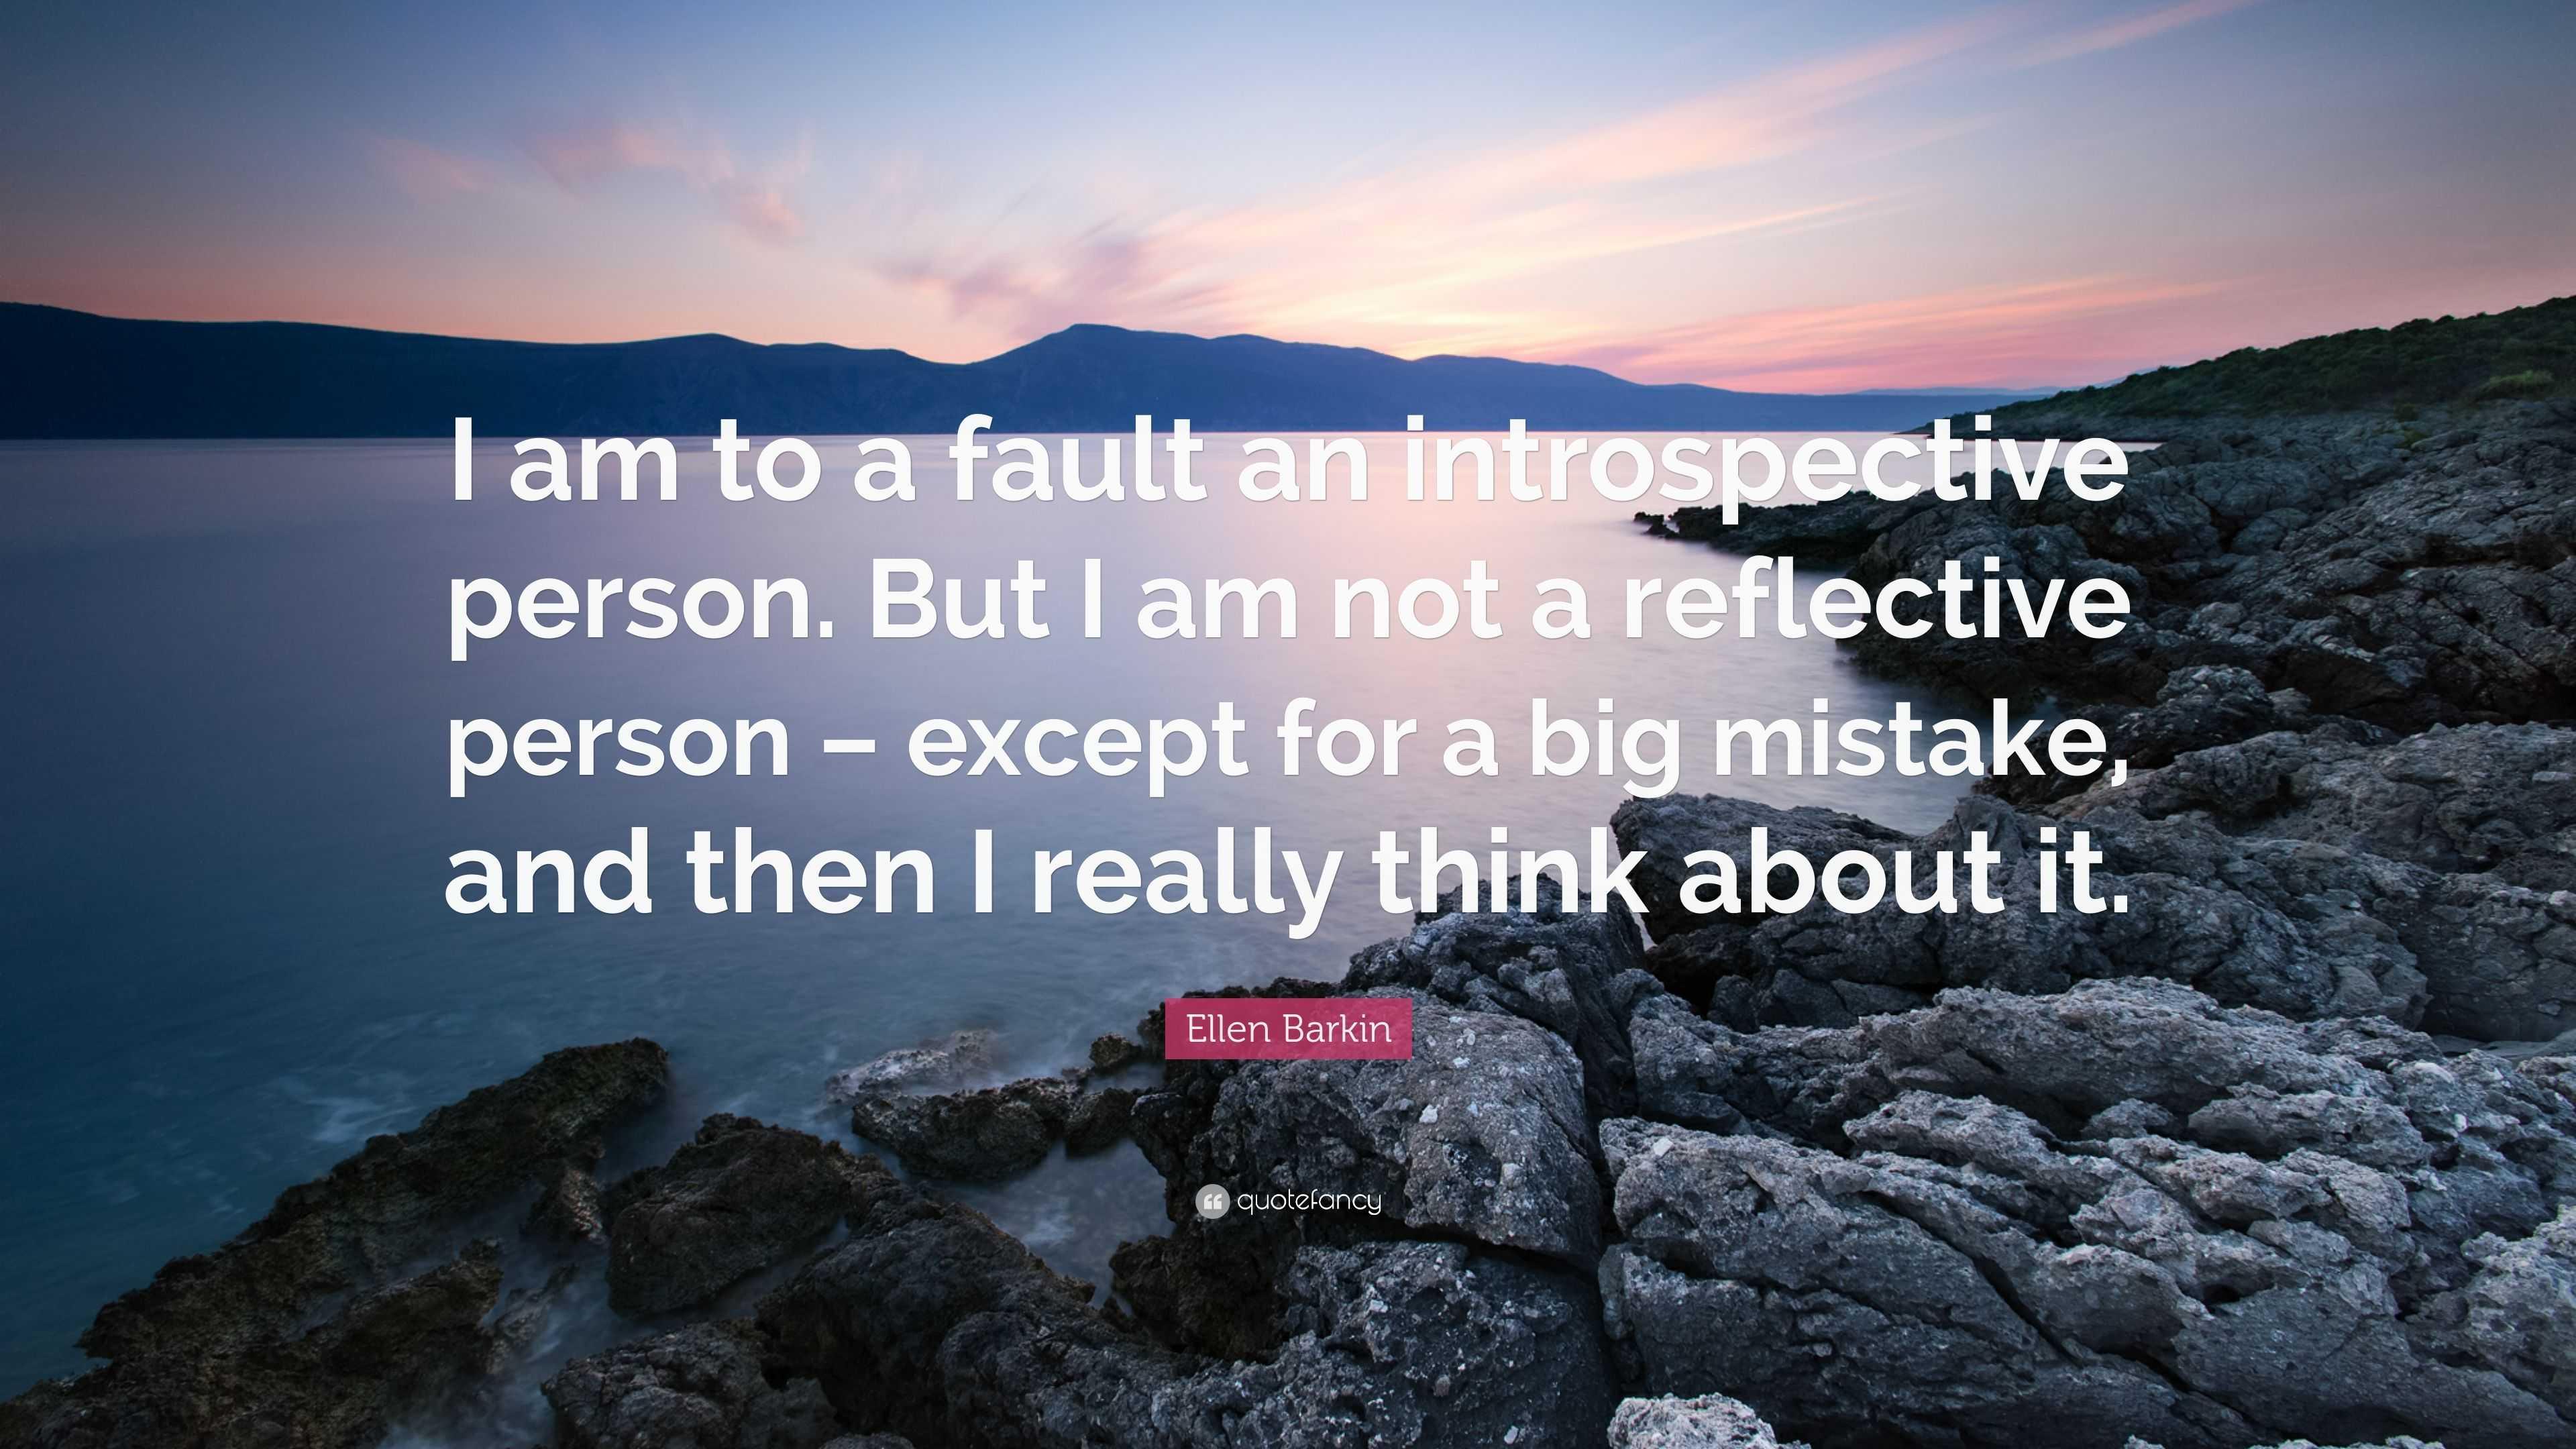 Ellen barkin quote i am to a fault an introspective person but i ellen barkin quote i am to a fault an introspective person but i publicscrutiny Images